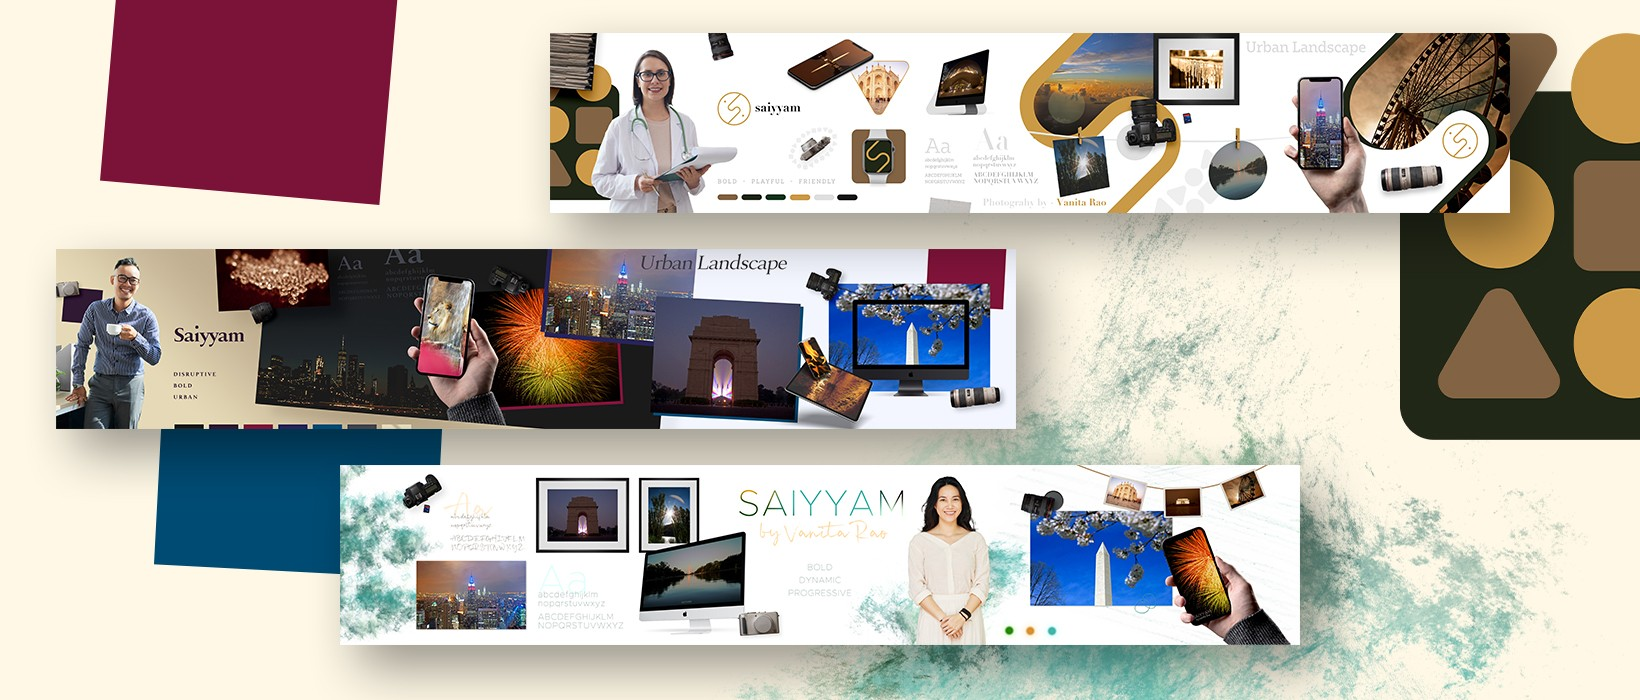 PulsAero designed brand identity stylescapes